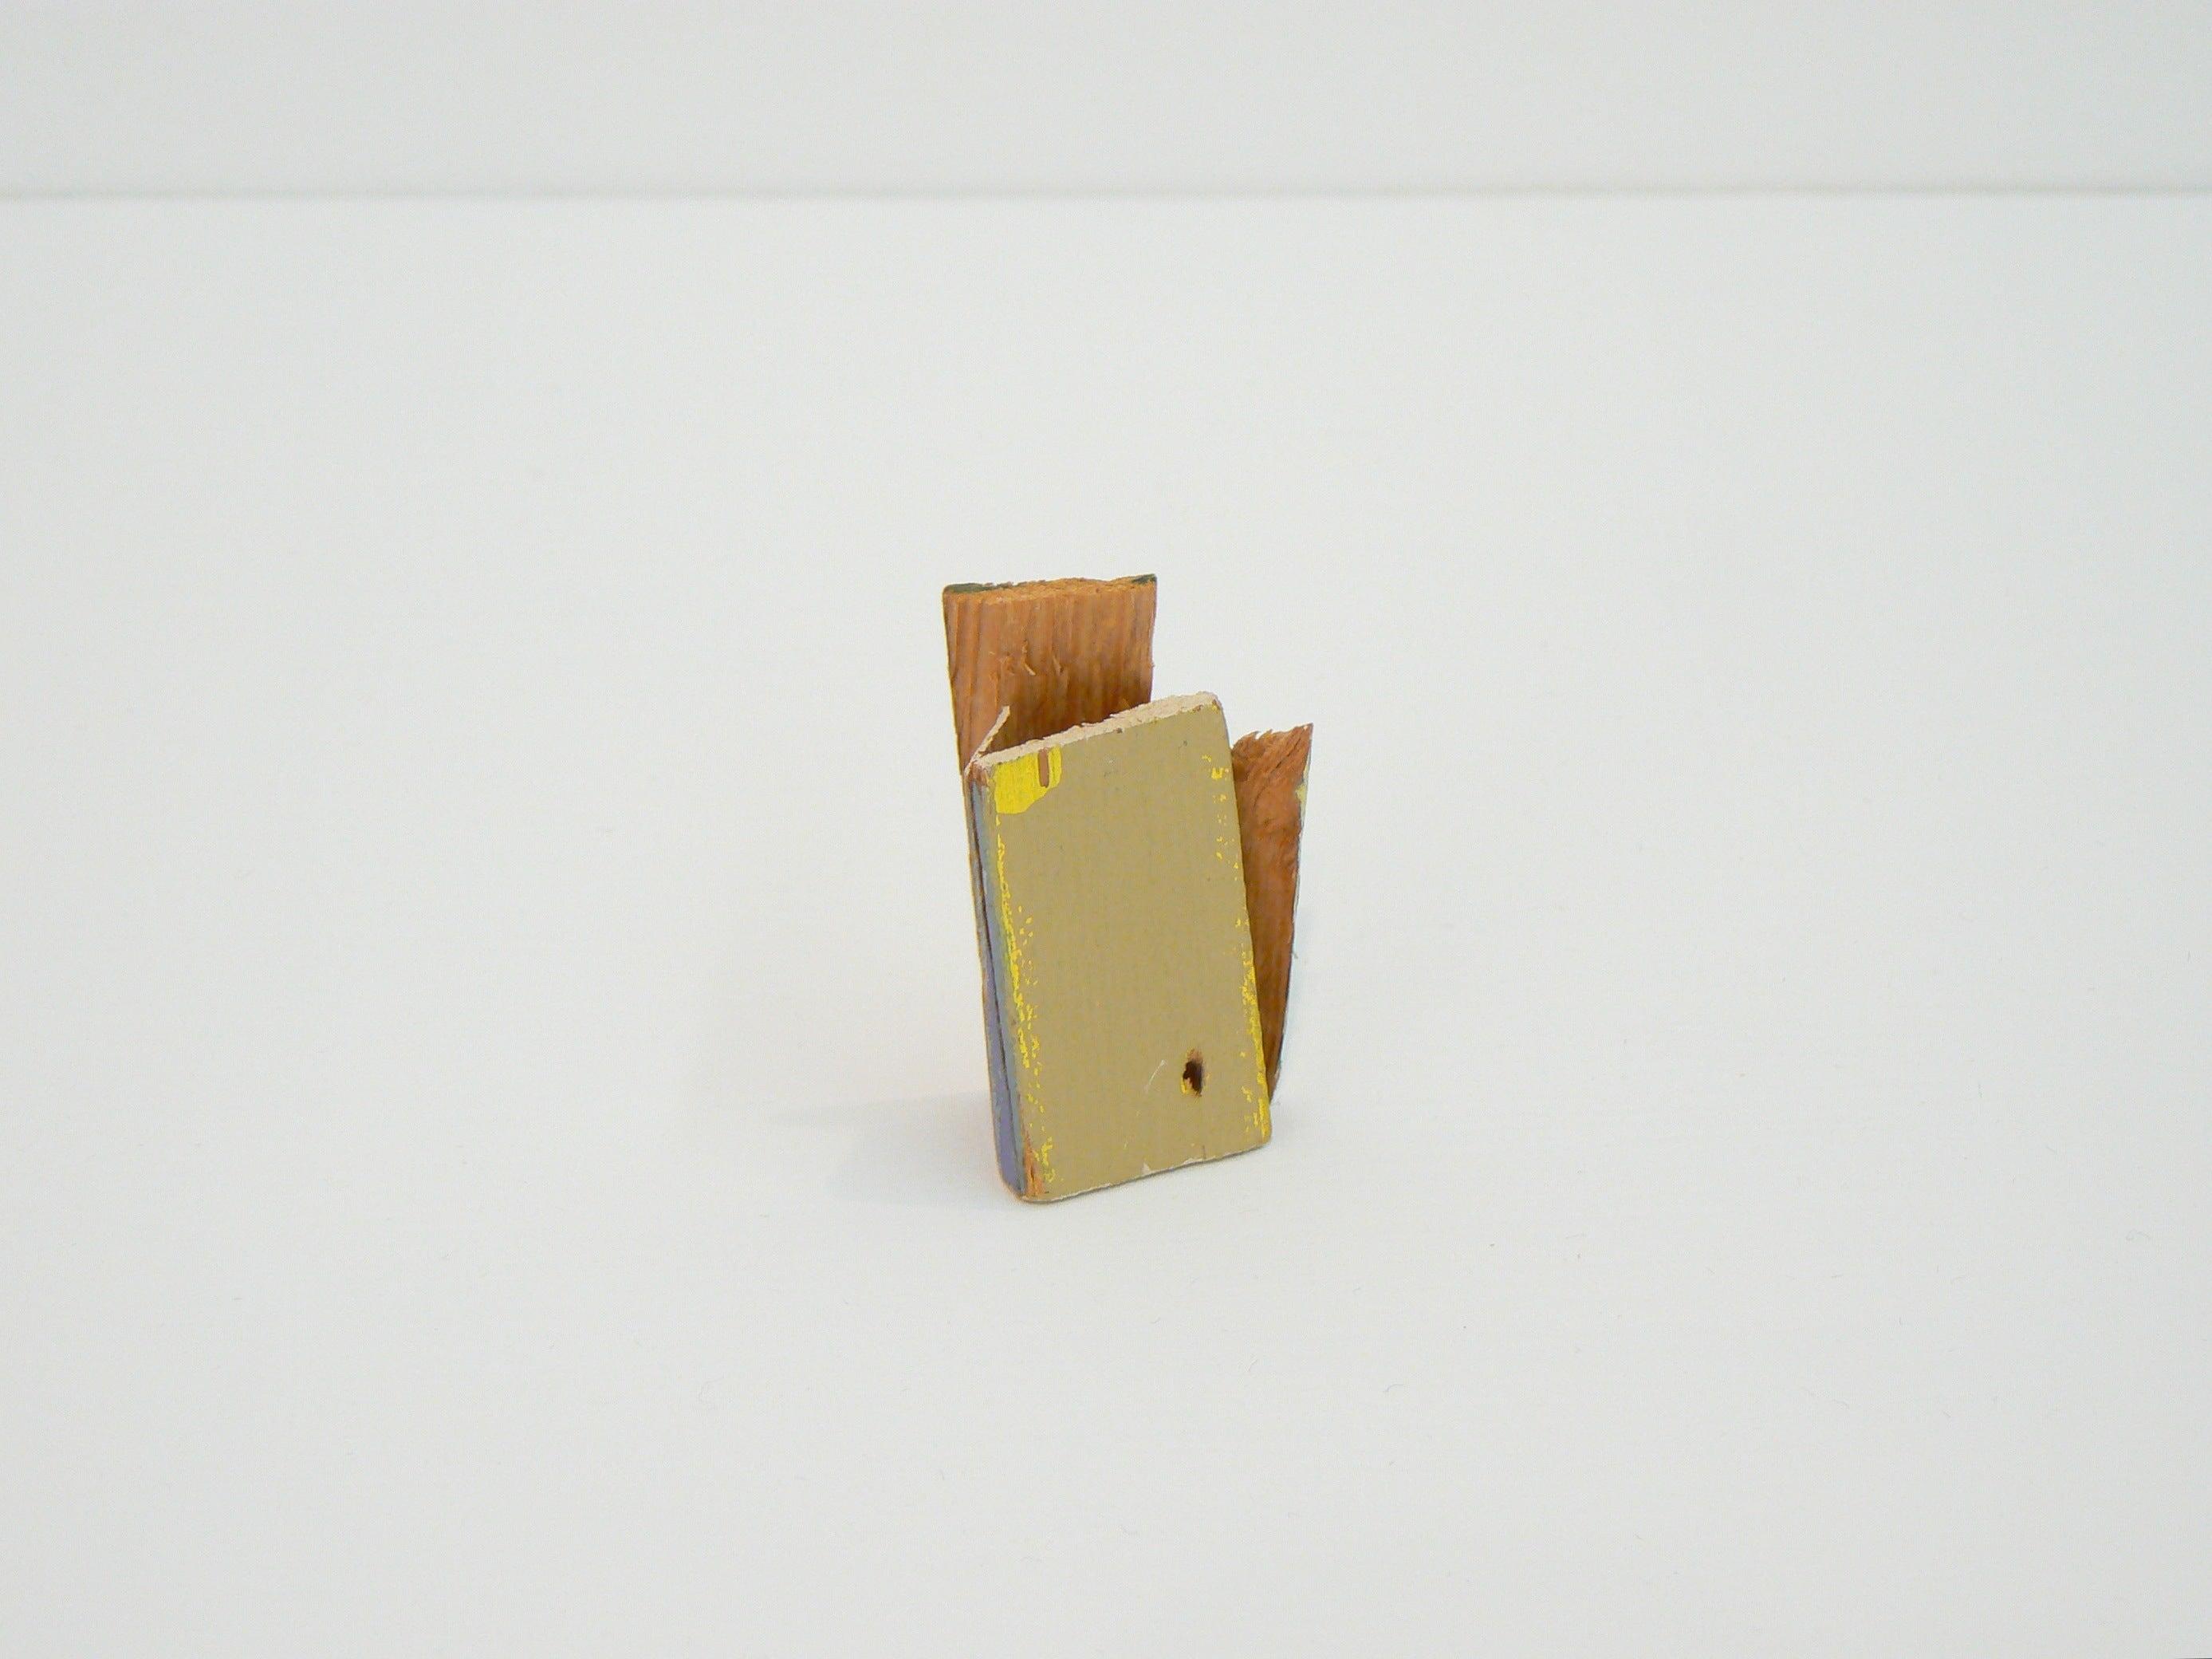 Liz Sweibel, Untitled (Scrapings #1), 2016, Wood, Paint, Found Objects